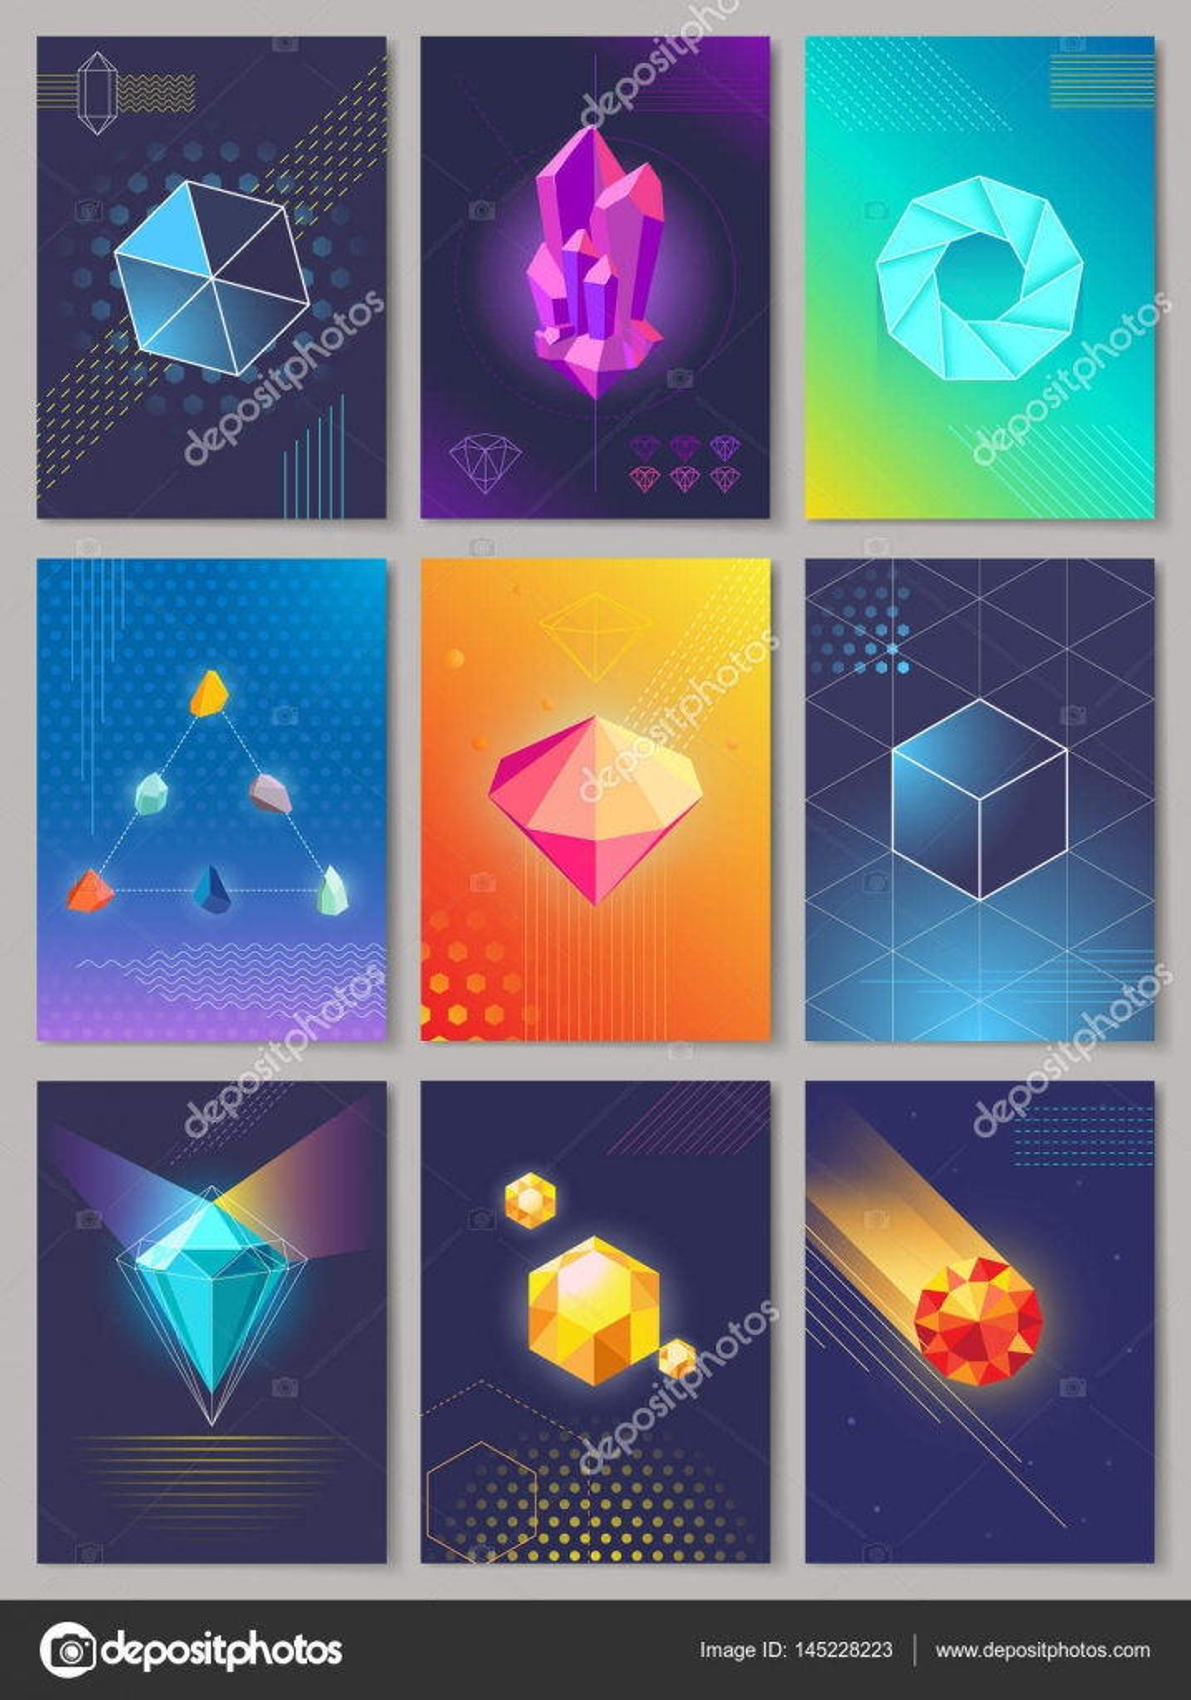 Precious Stones Colourful Collection of Nine. — Stock Vector ...